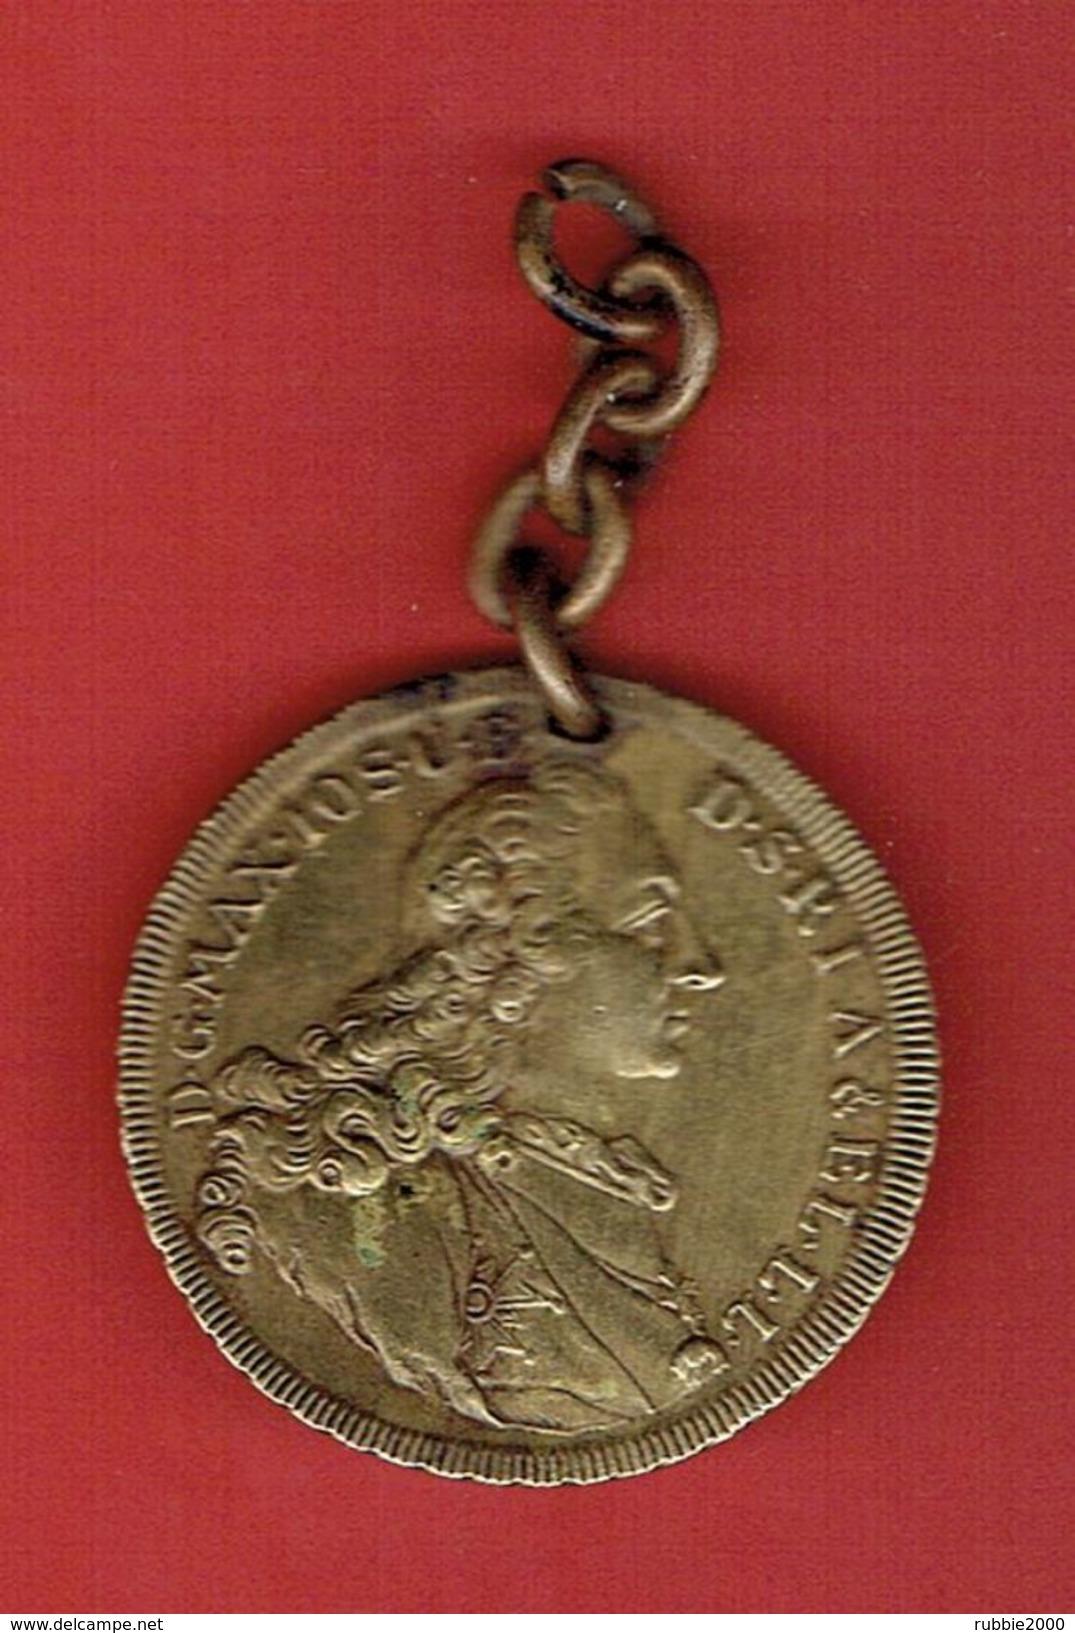 MEDAILLE MAXIMILIEN III JOSEPH DE BAVIERE ALLEMAGNE 1760 BAYERN MAXIMILIAN III PATRONA BAVARIAE - Royaux/De Noblesse